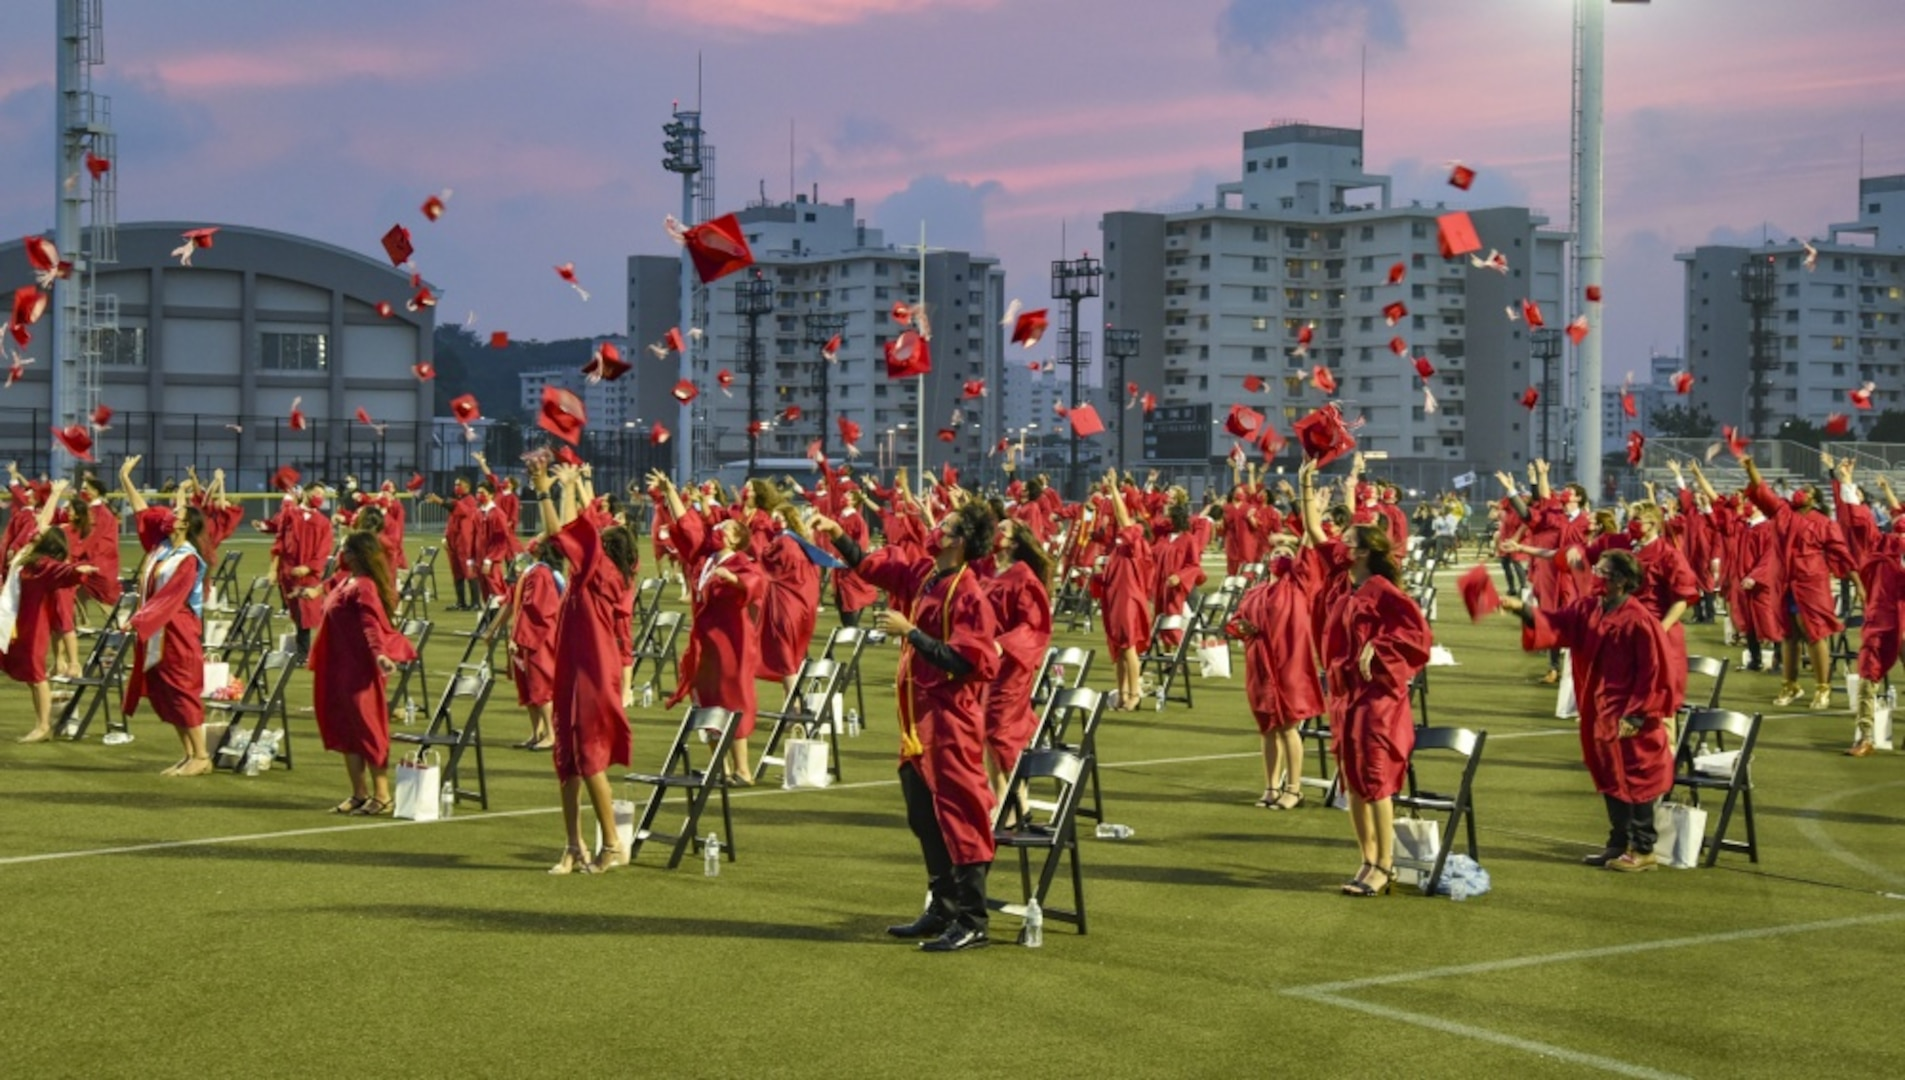 High School on U.S. Navy Base in Japan Holds Socially Distanced Graduation Ceremony